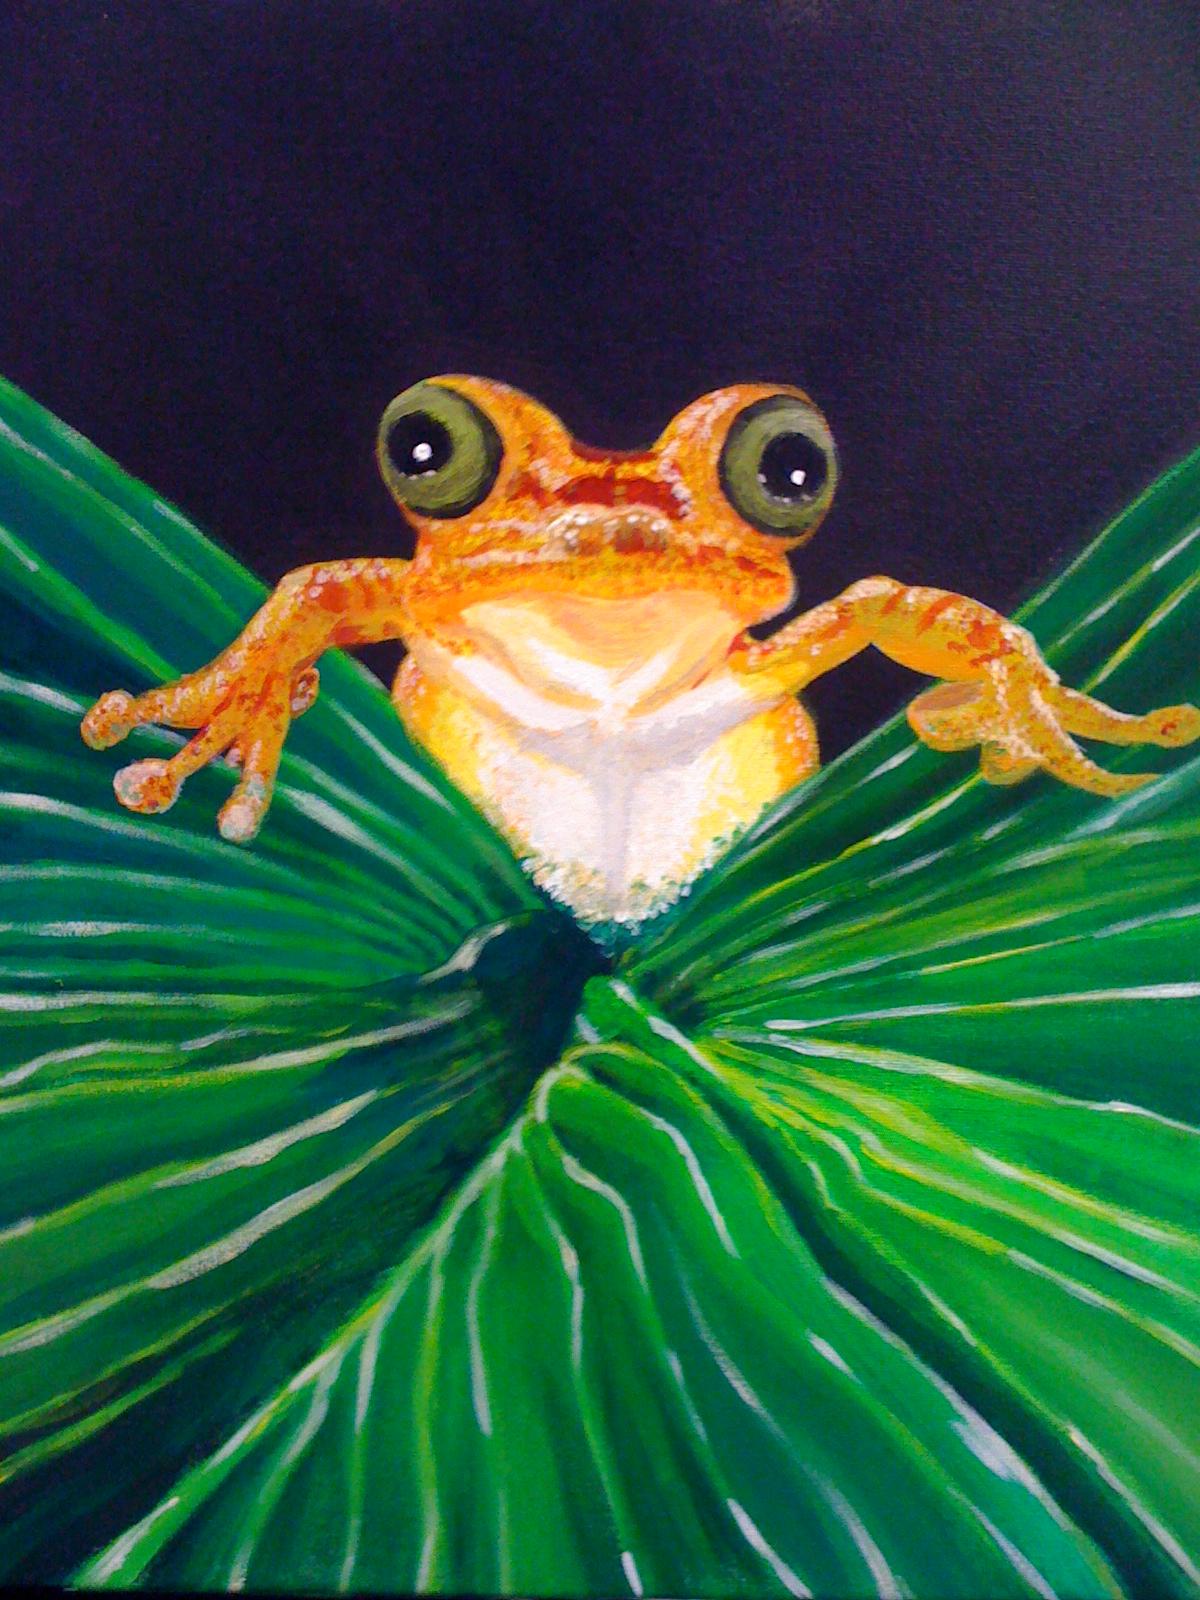 Jungle Frog Painting. by Albinodunmer on DeviantArt